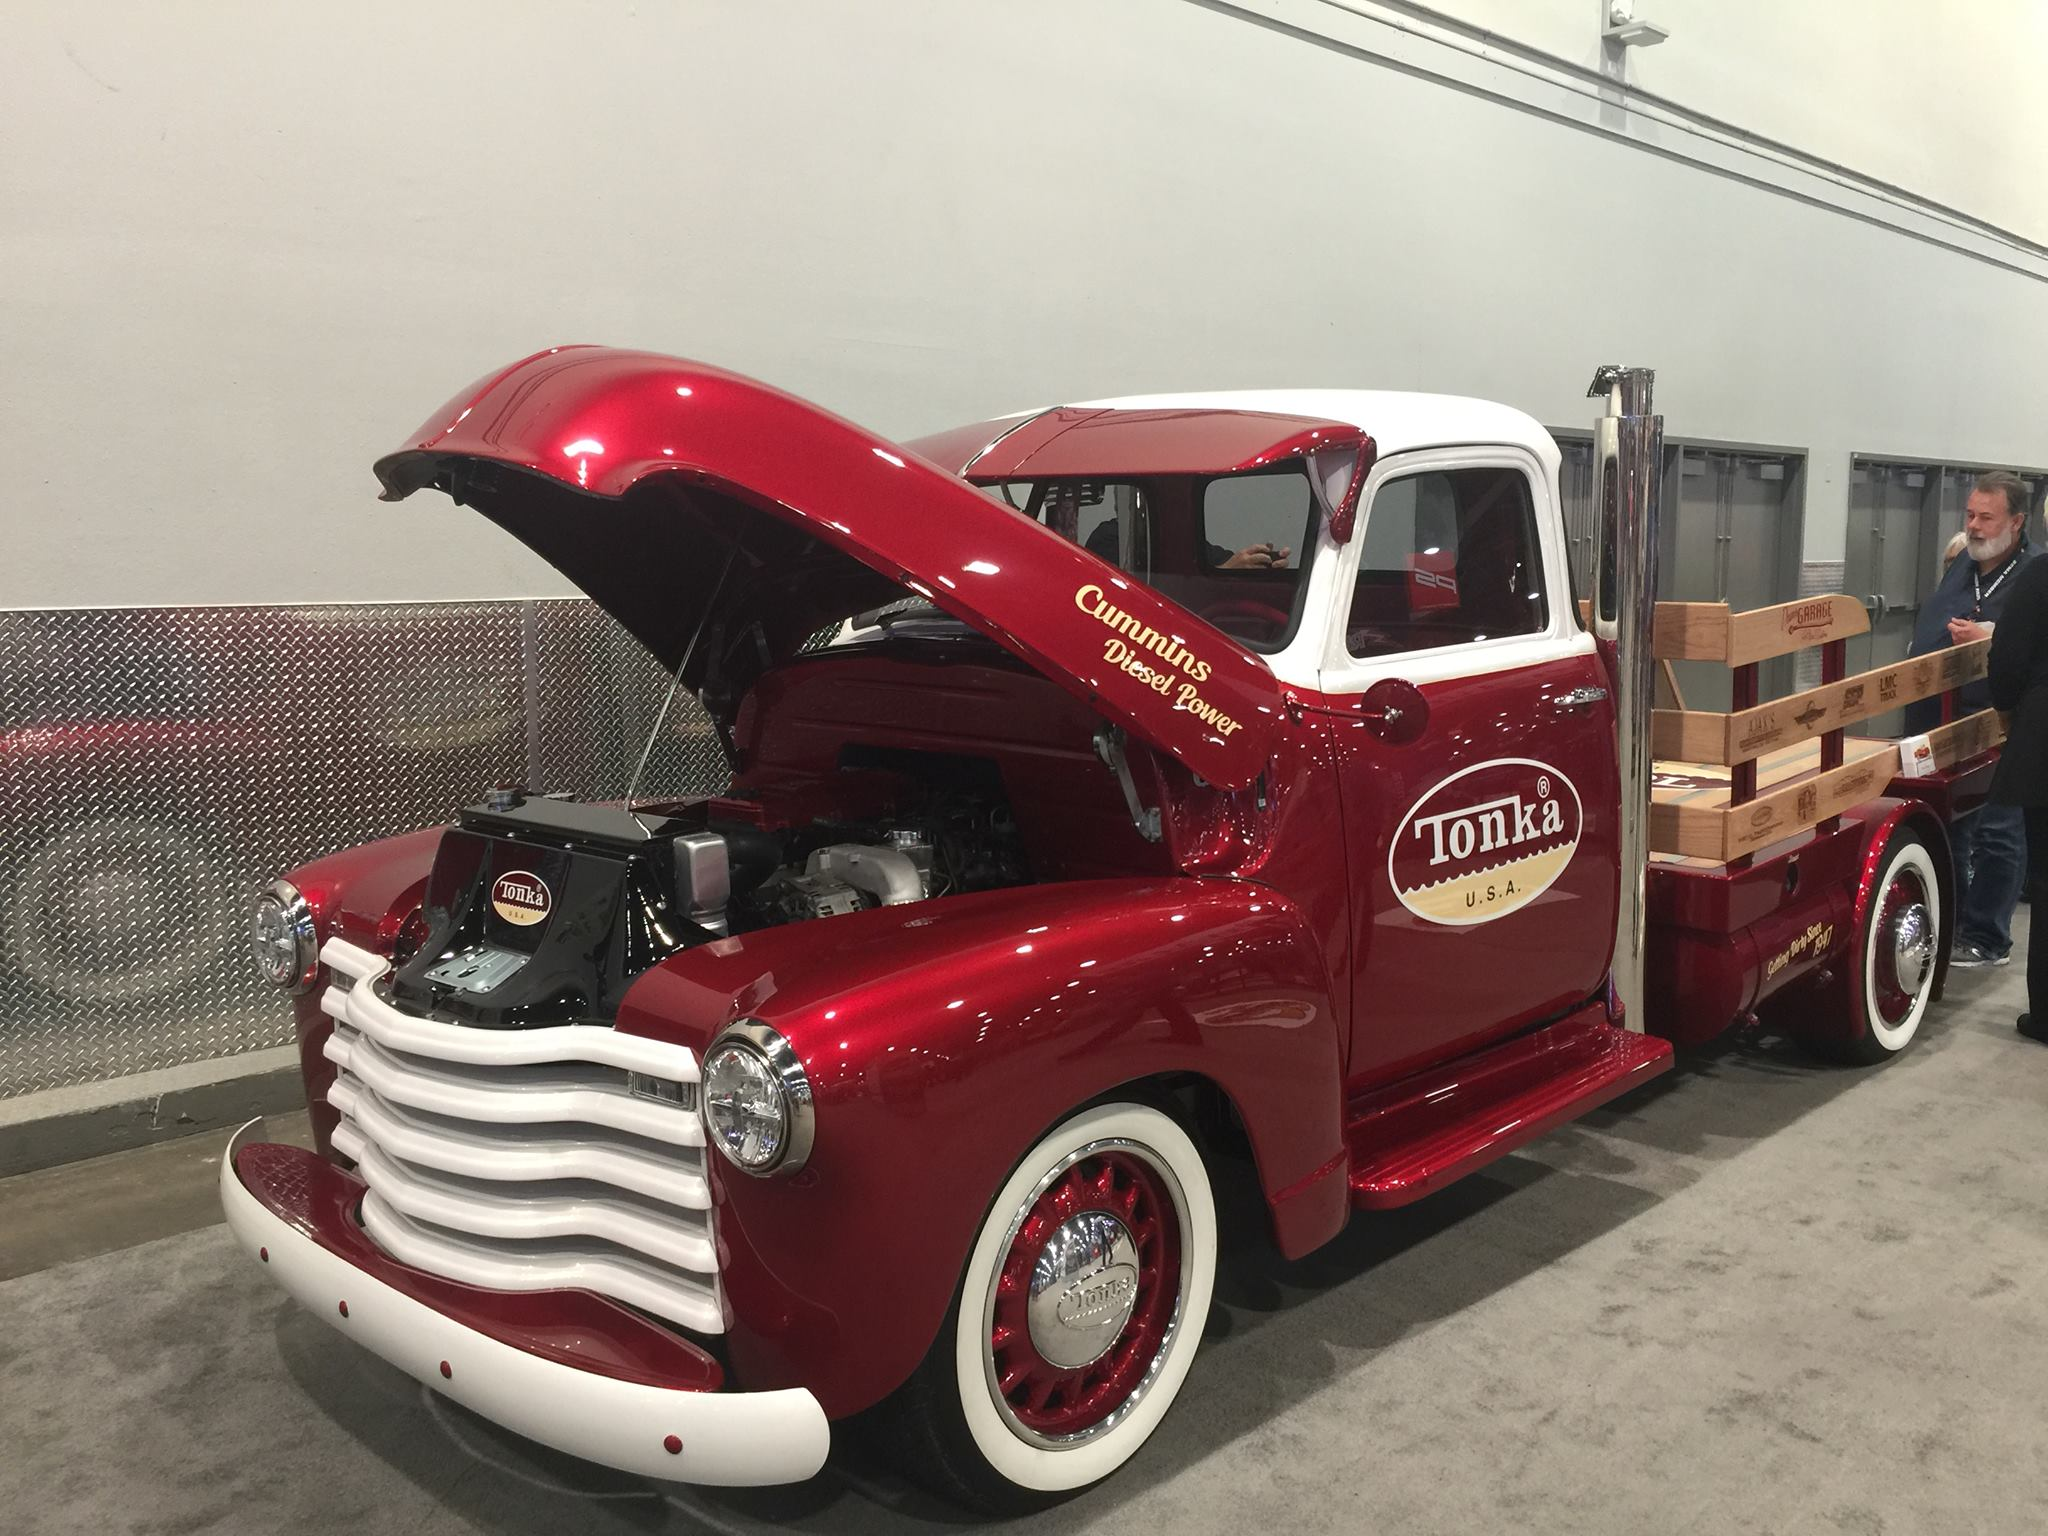 Restomod Trucks SEMA - tonka